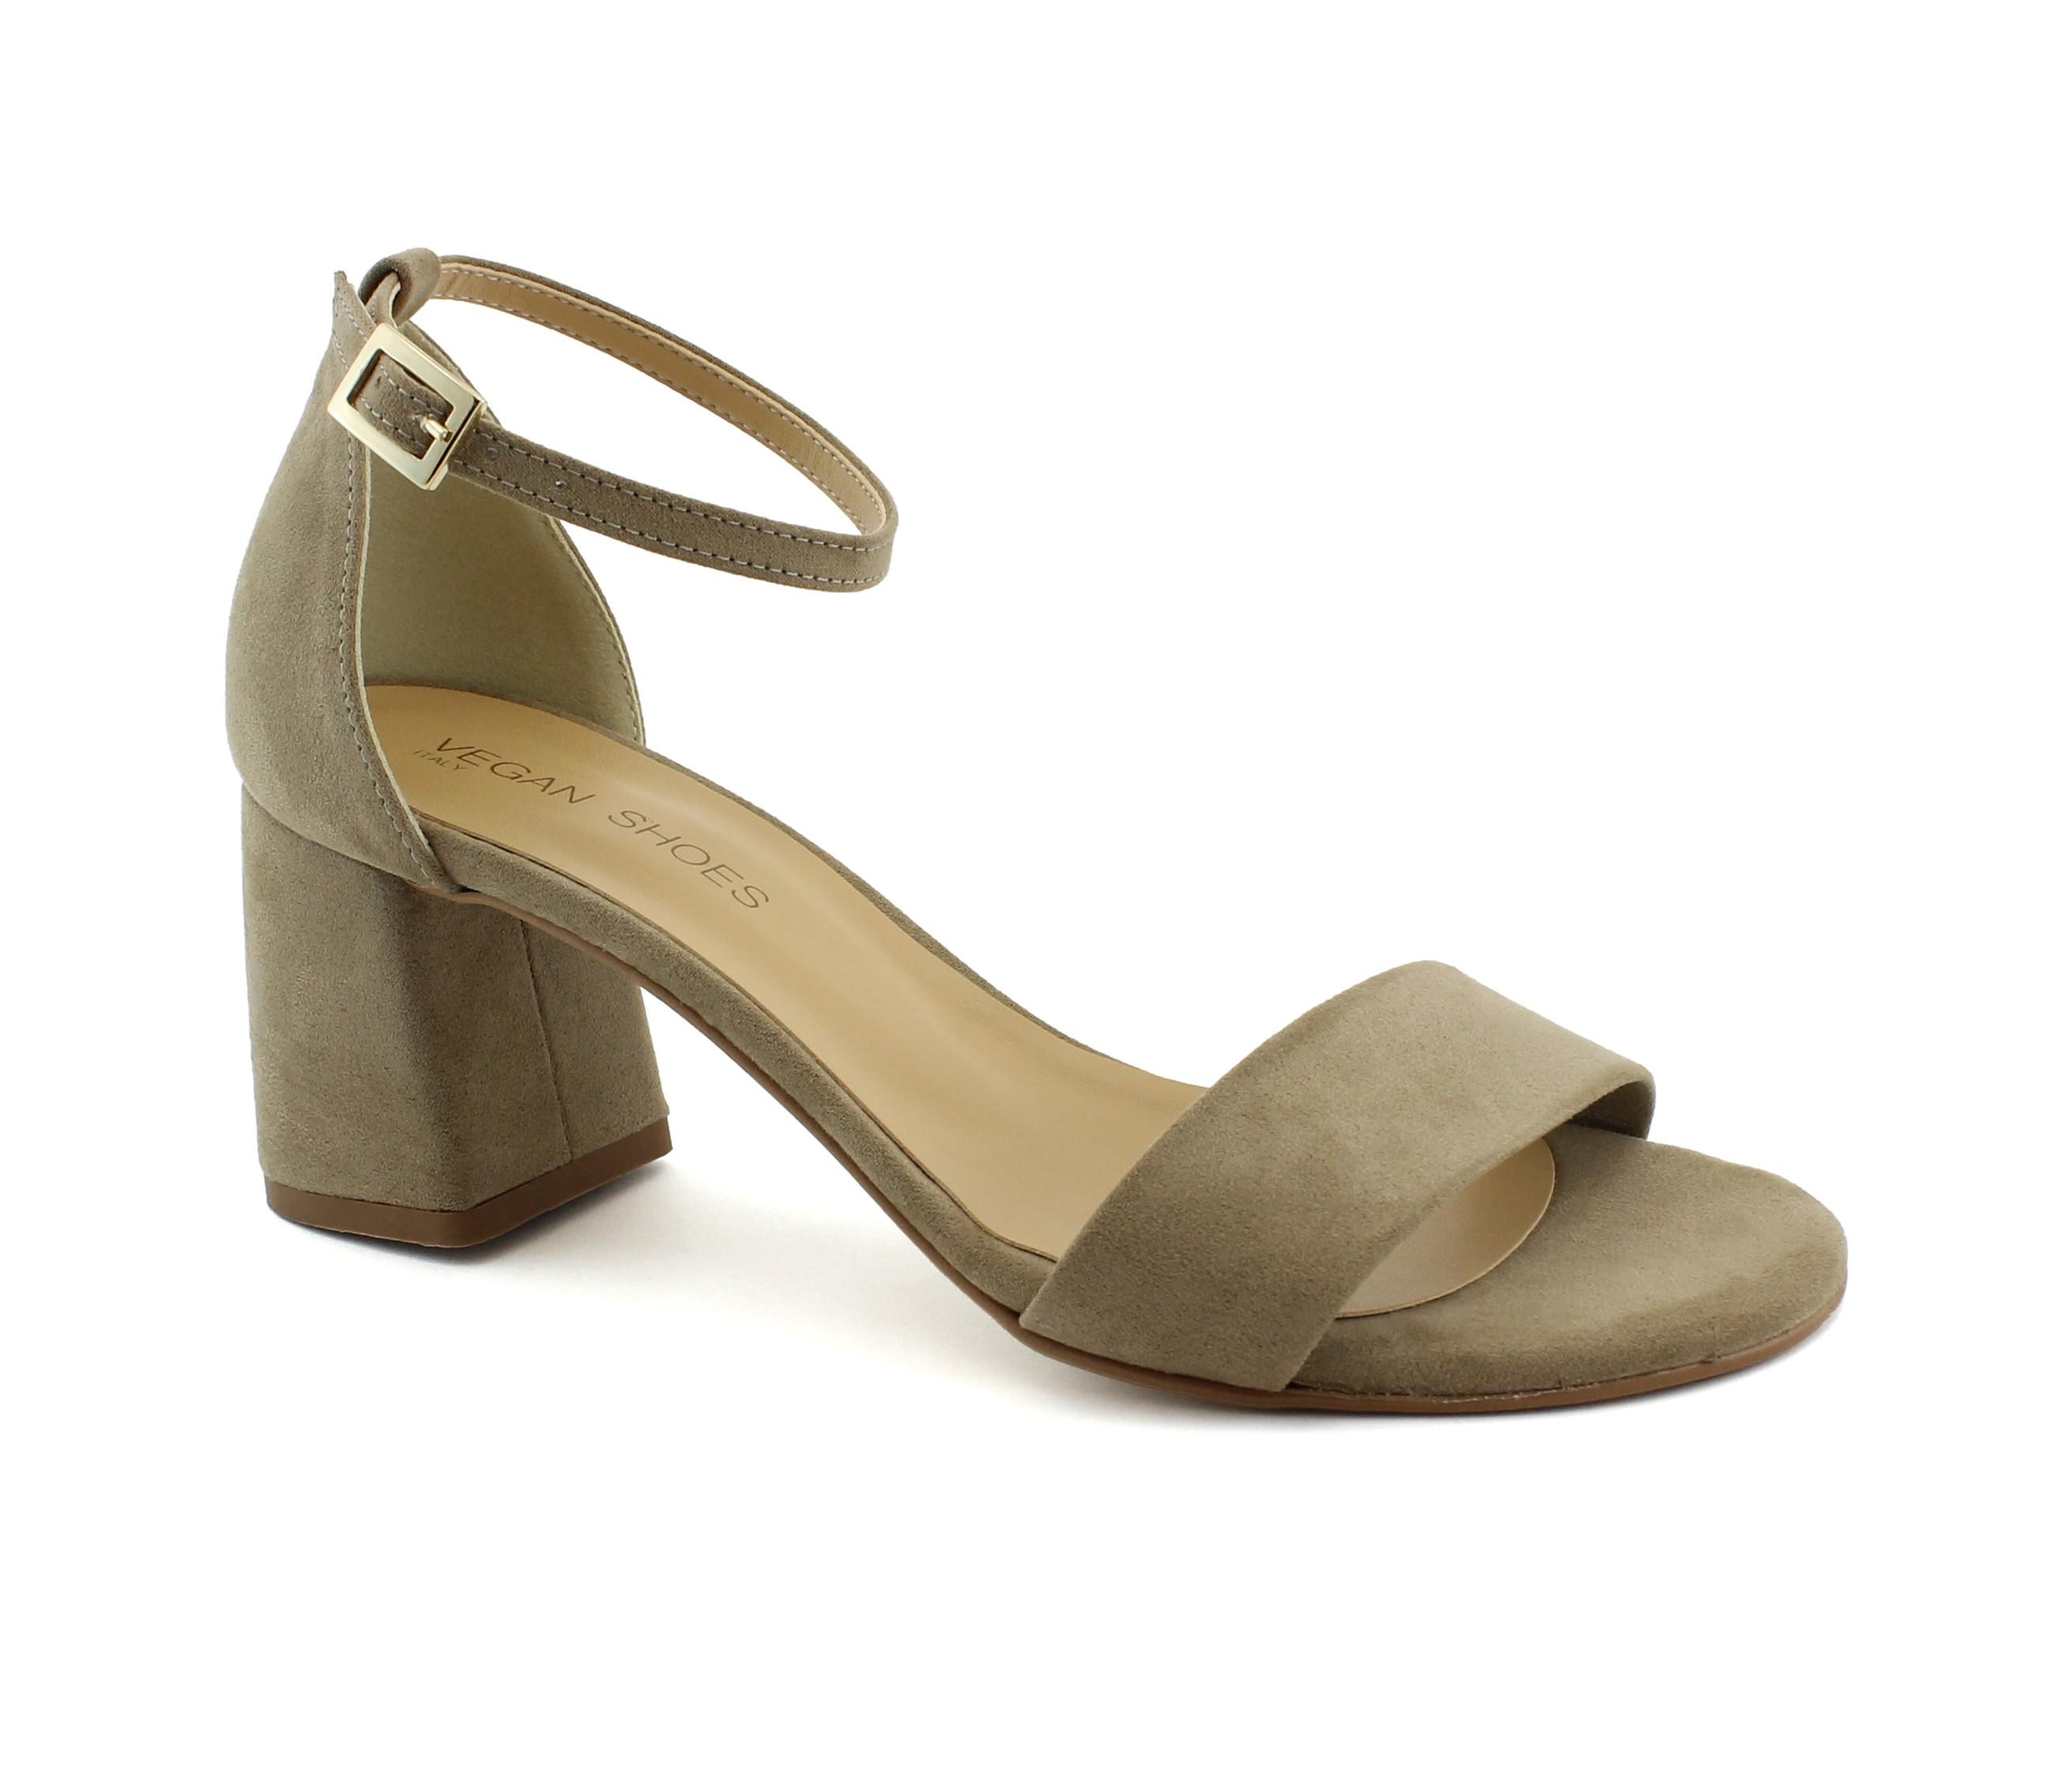 sandali vegan donna tacco beige cinturino fibbia